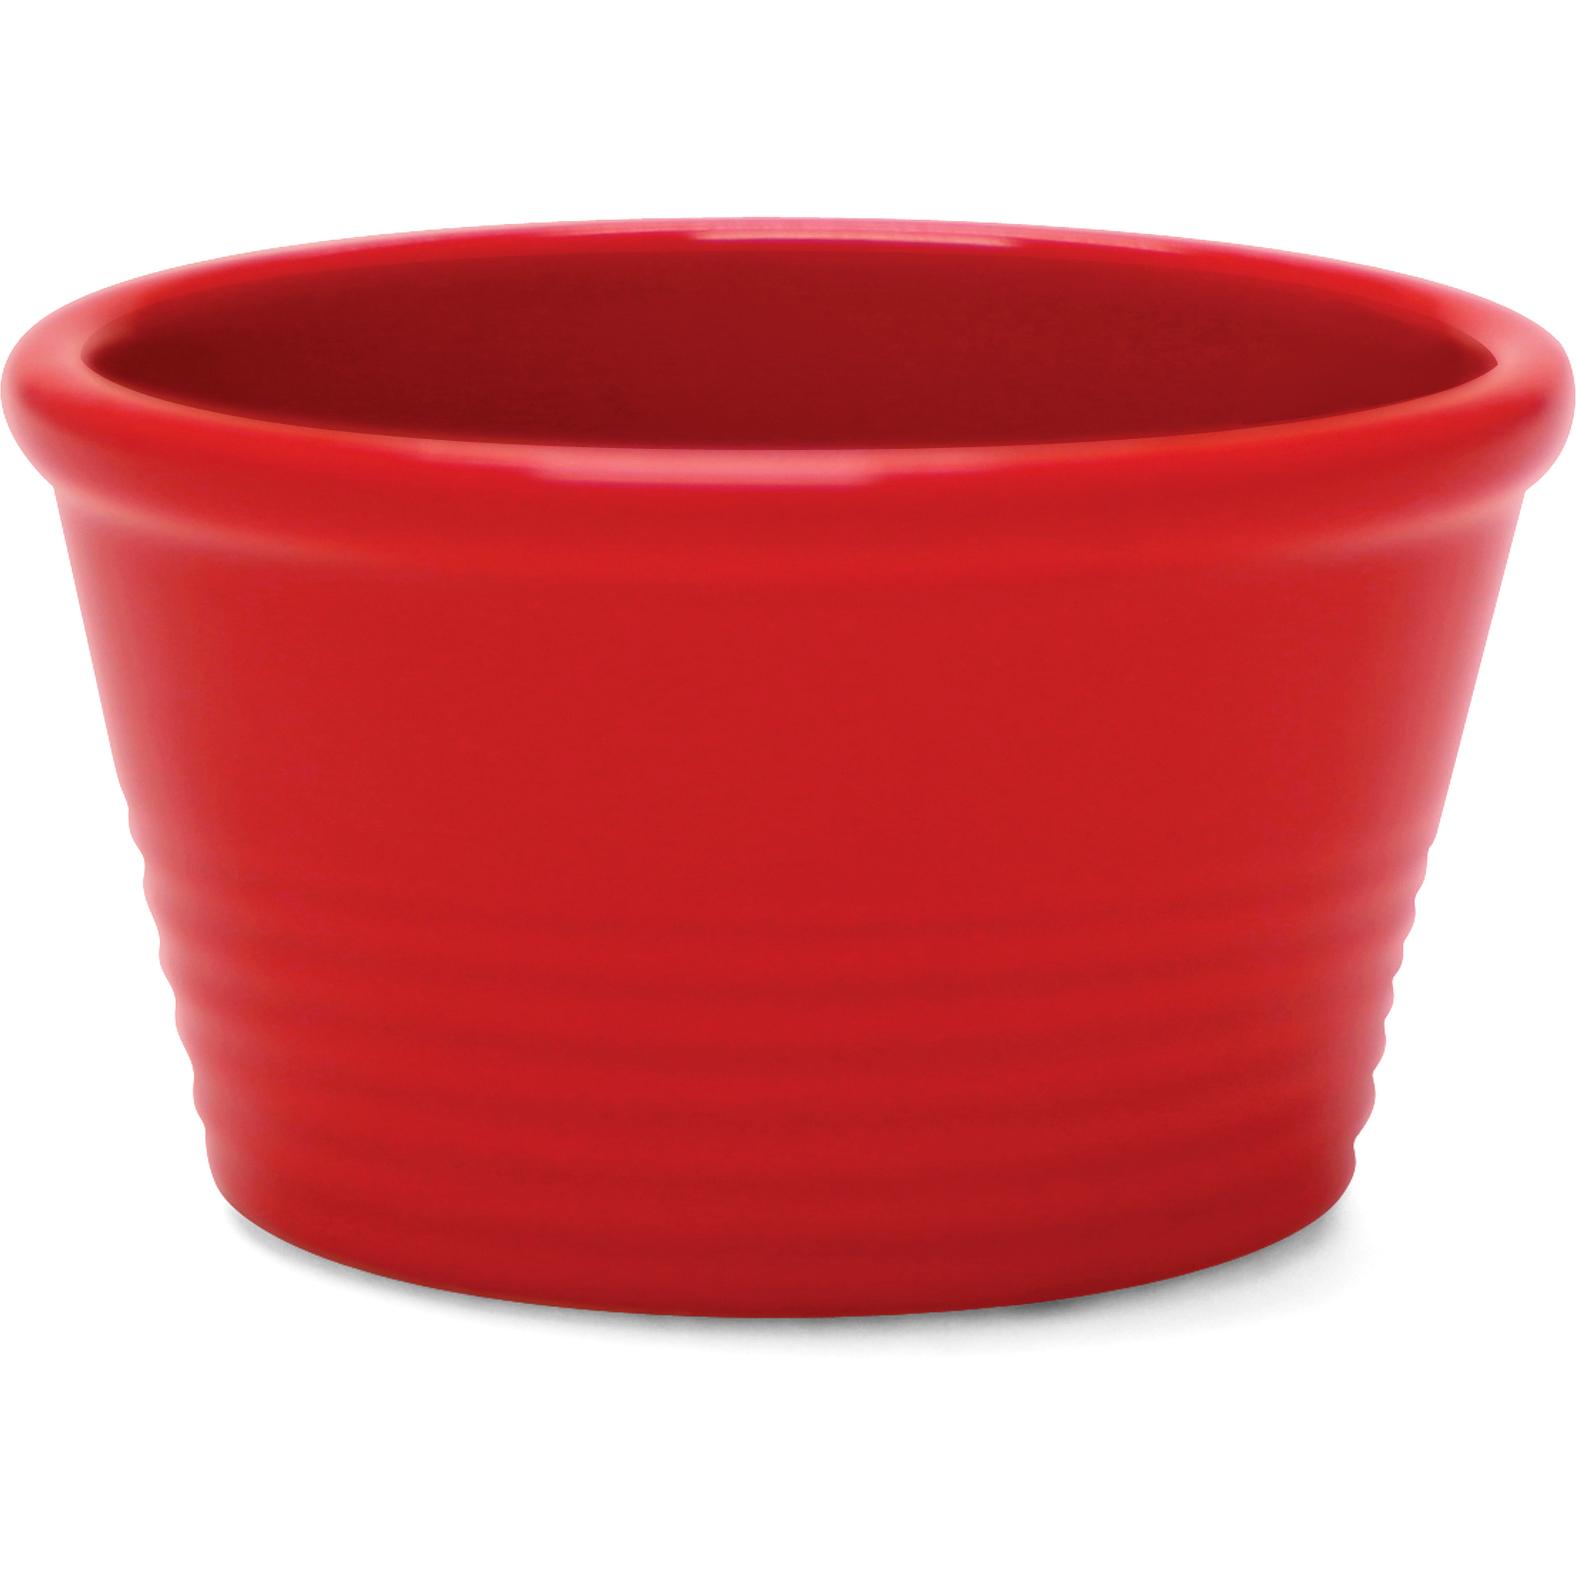 Chantal True Red 1 Cup Stackable Ramekin